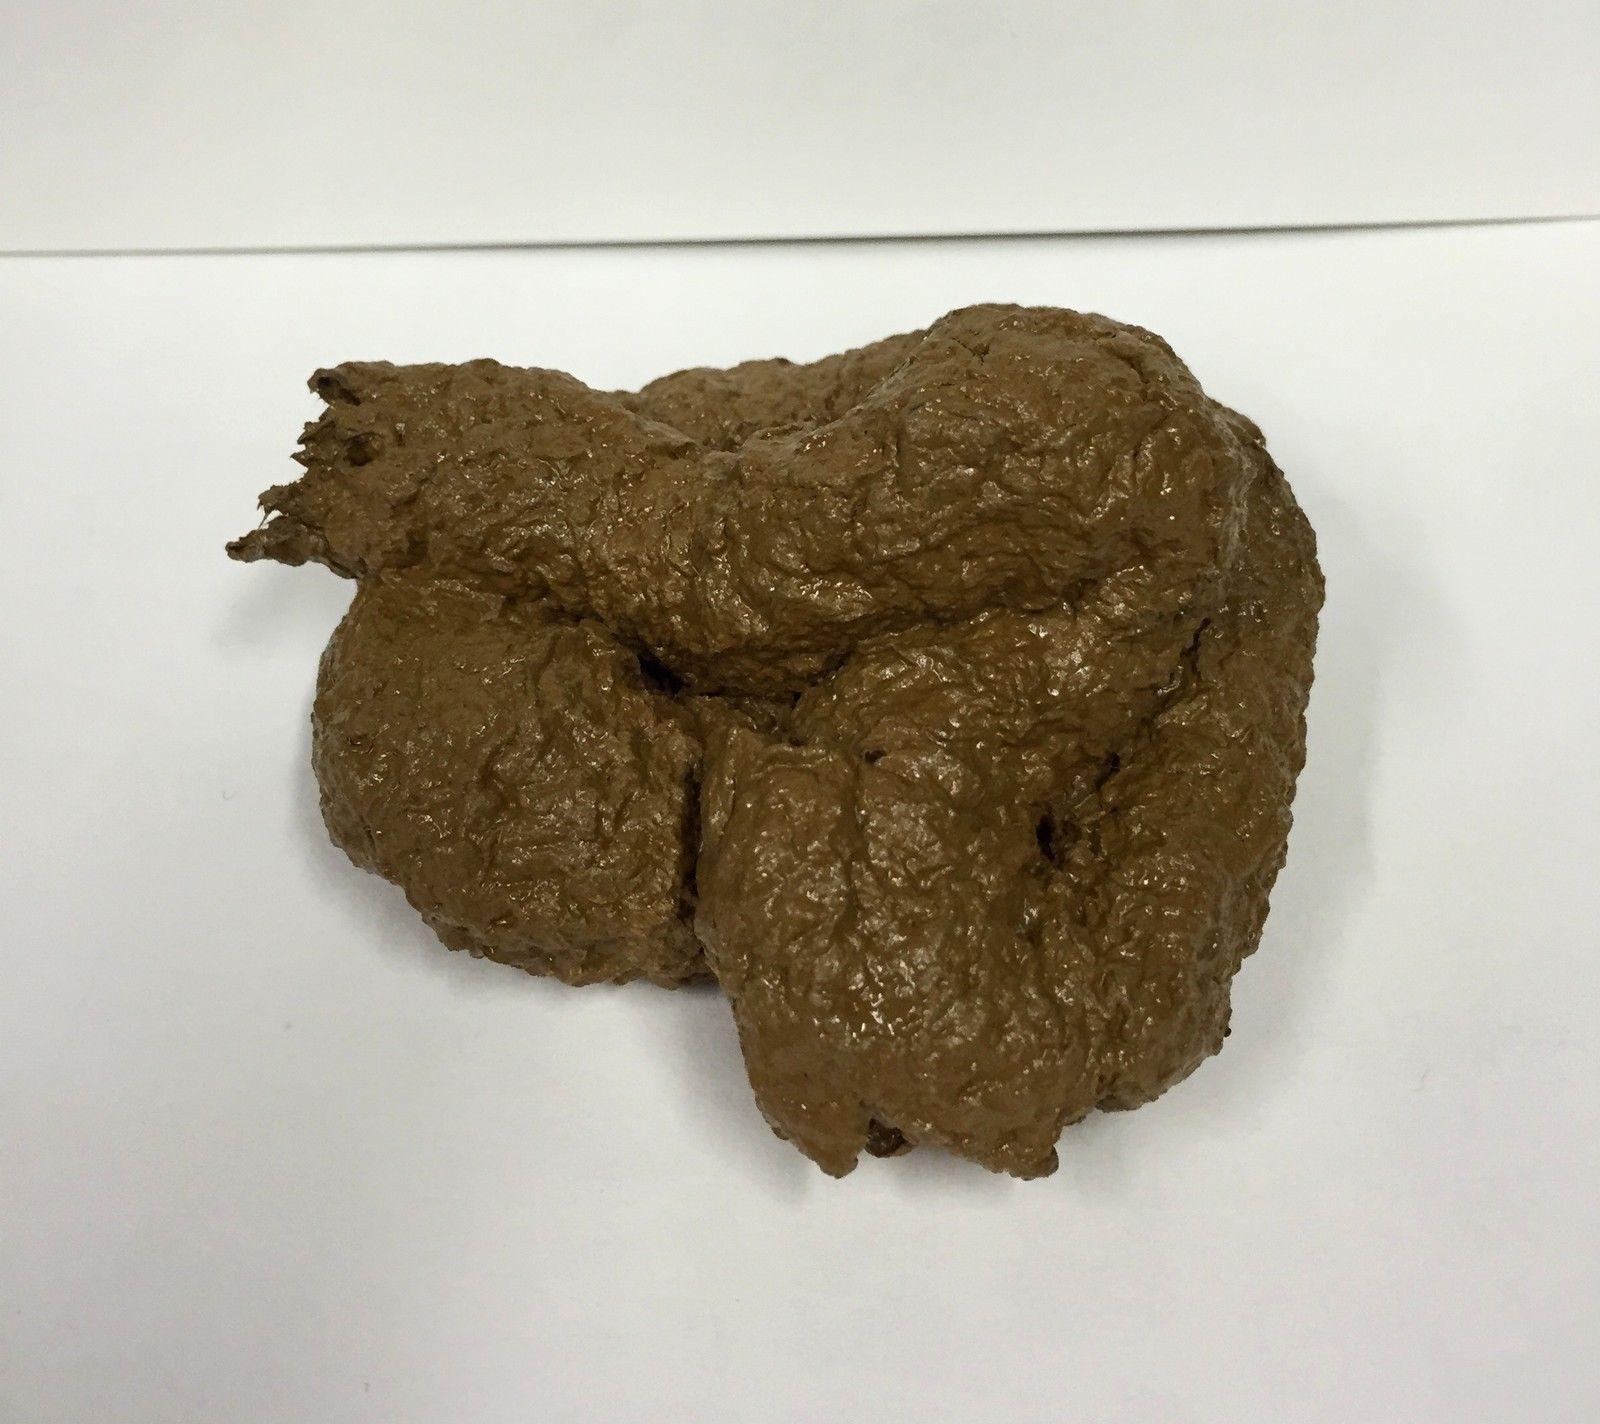 PREMIUM Fake Dog Poop Doggie Poo Realistic Doggy Doo Doo Dirt Joke Gag Crap Pile